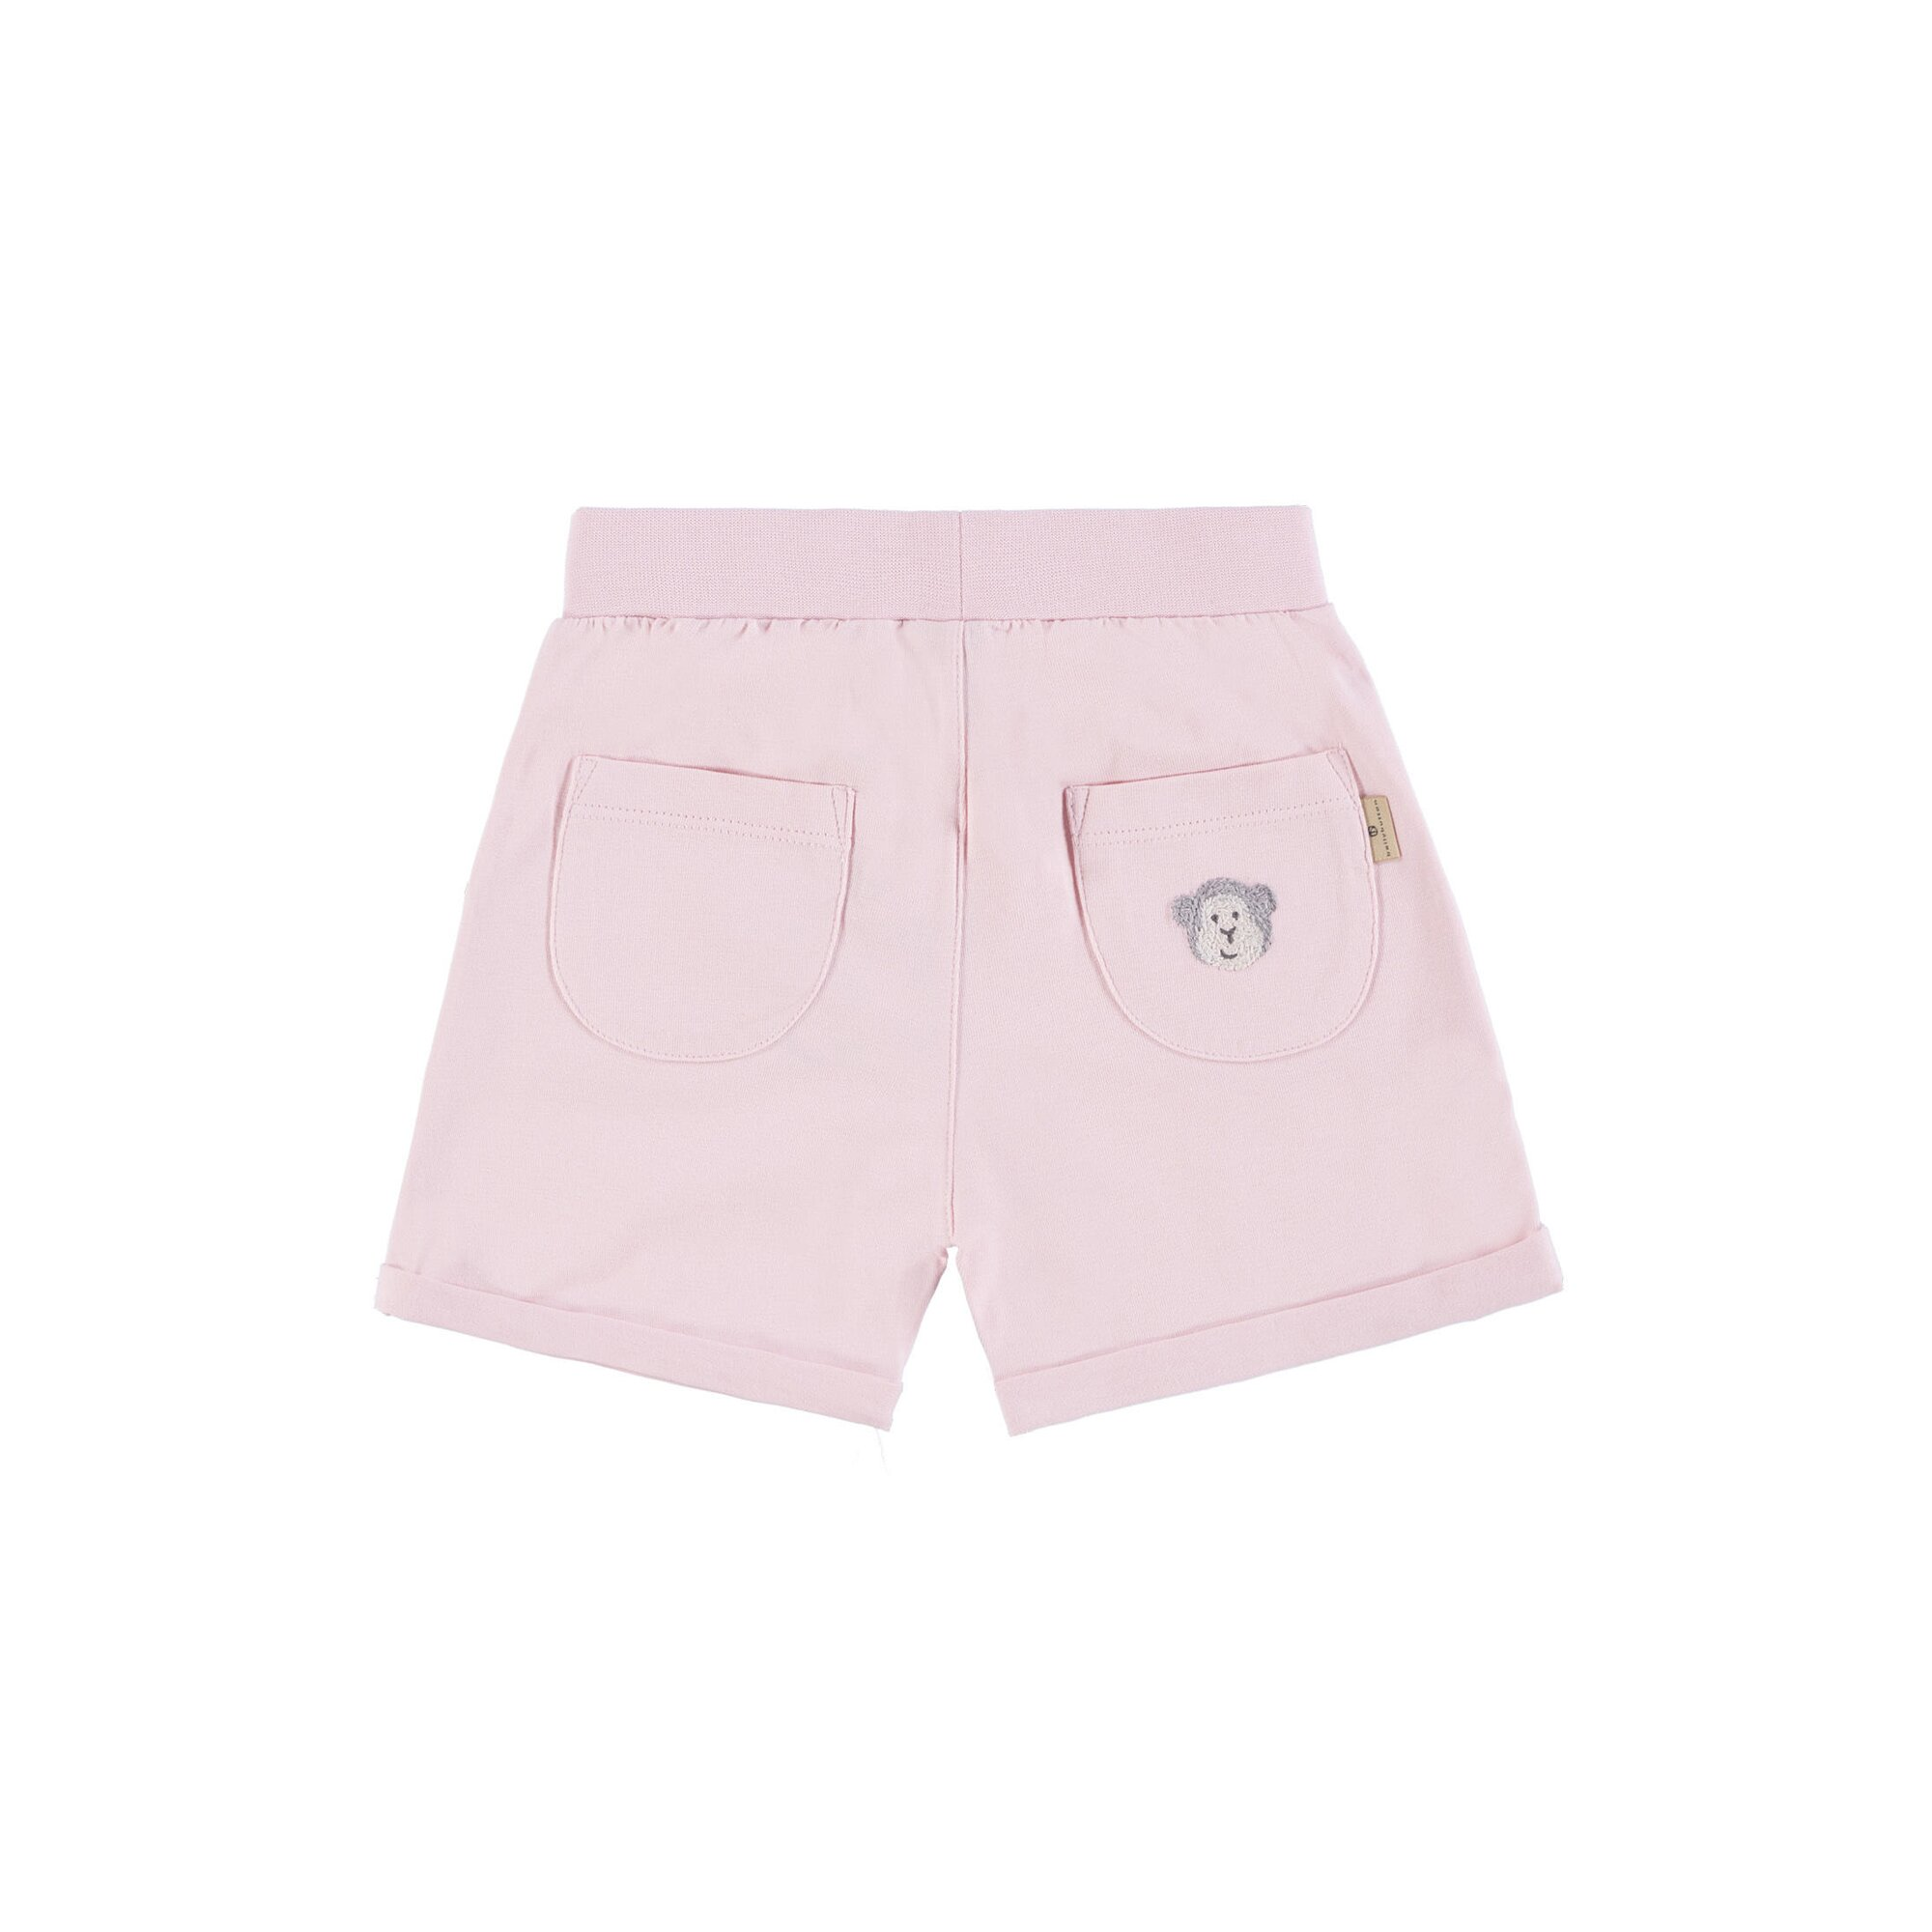 bellybutton-shorts